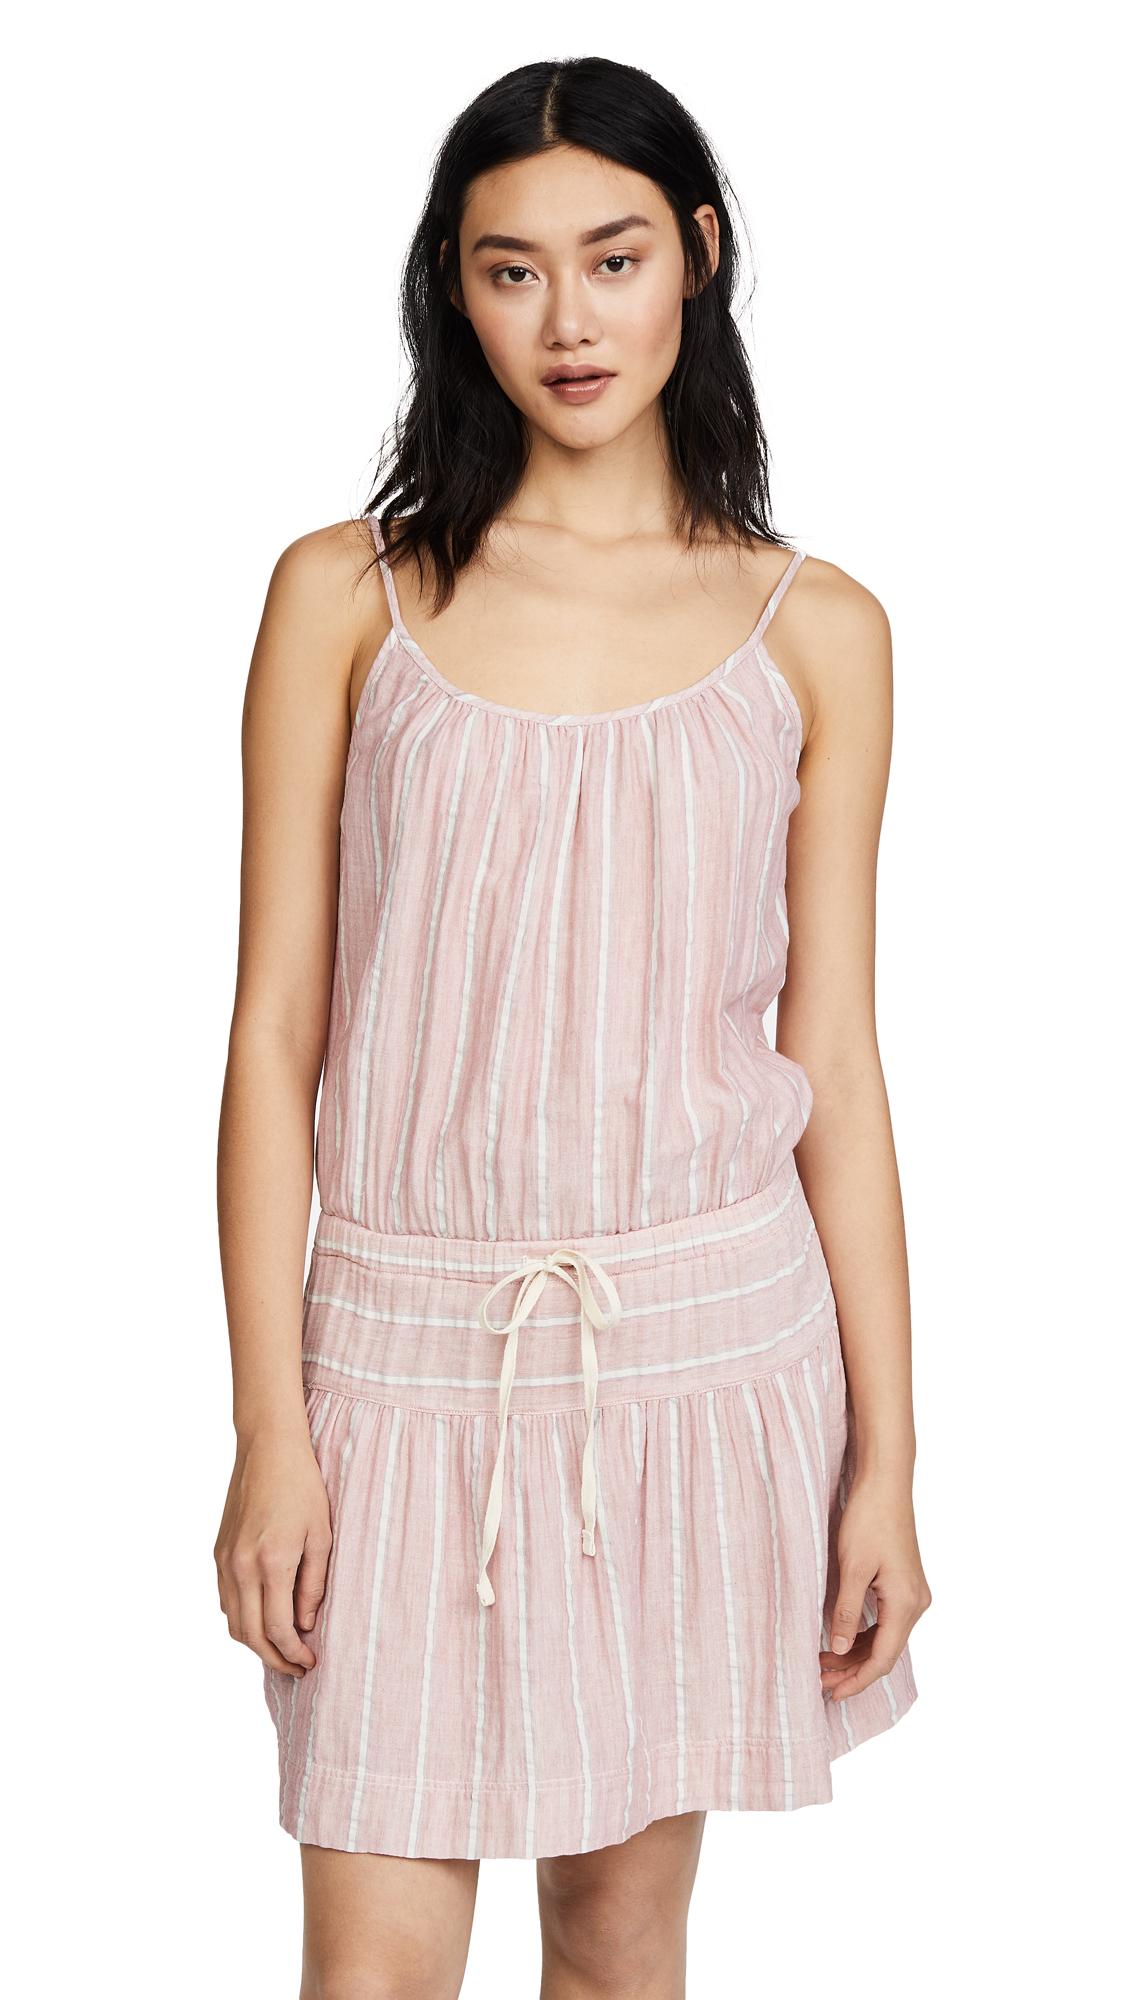 XIRENA Charlie Saskia Dress - Coral Pink